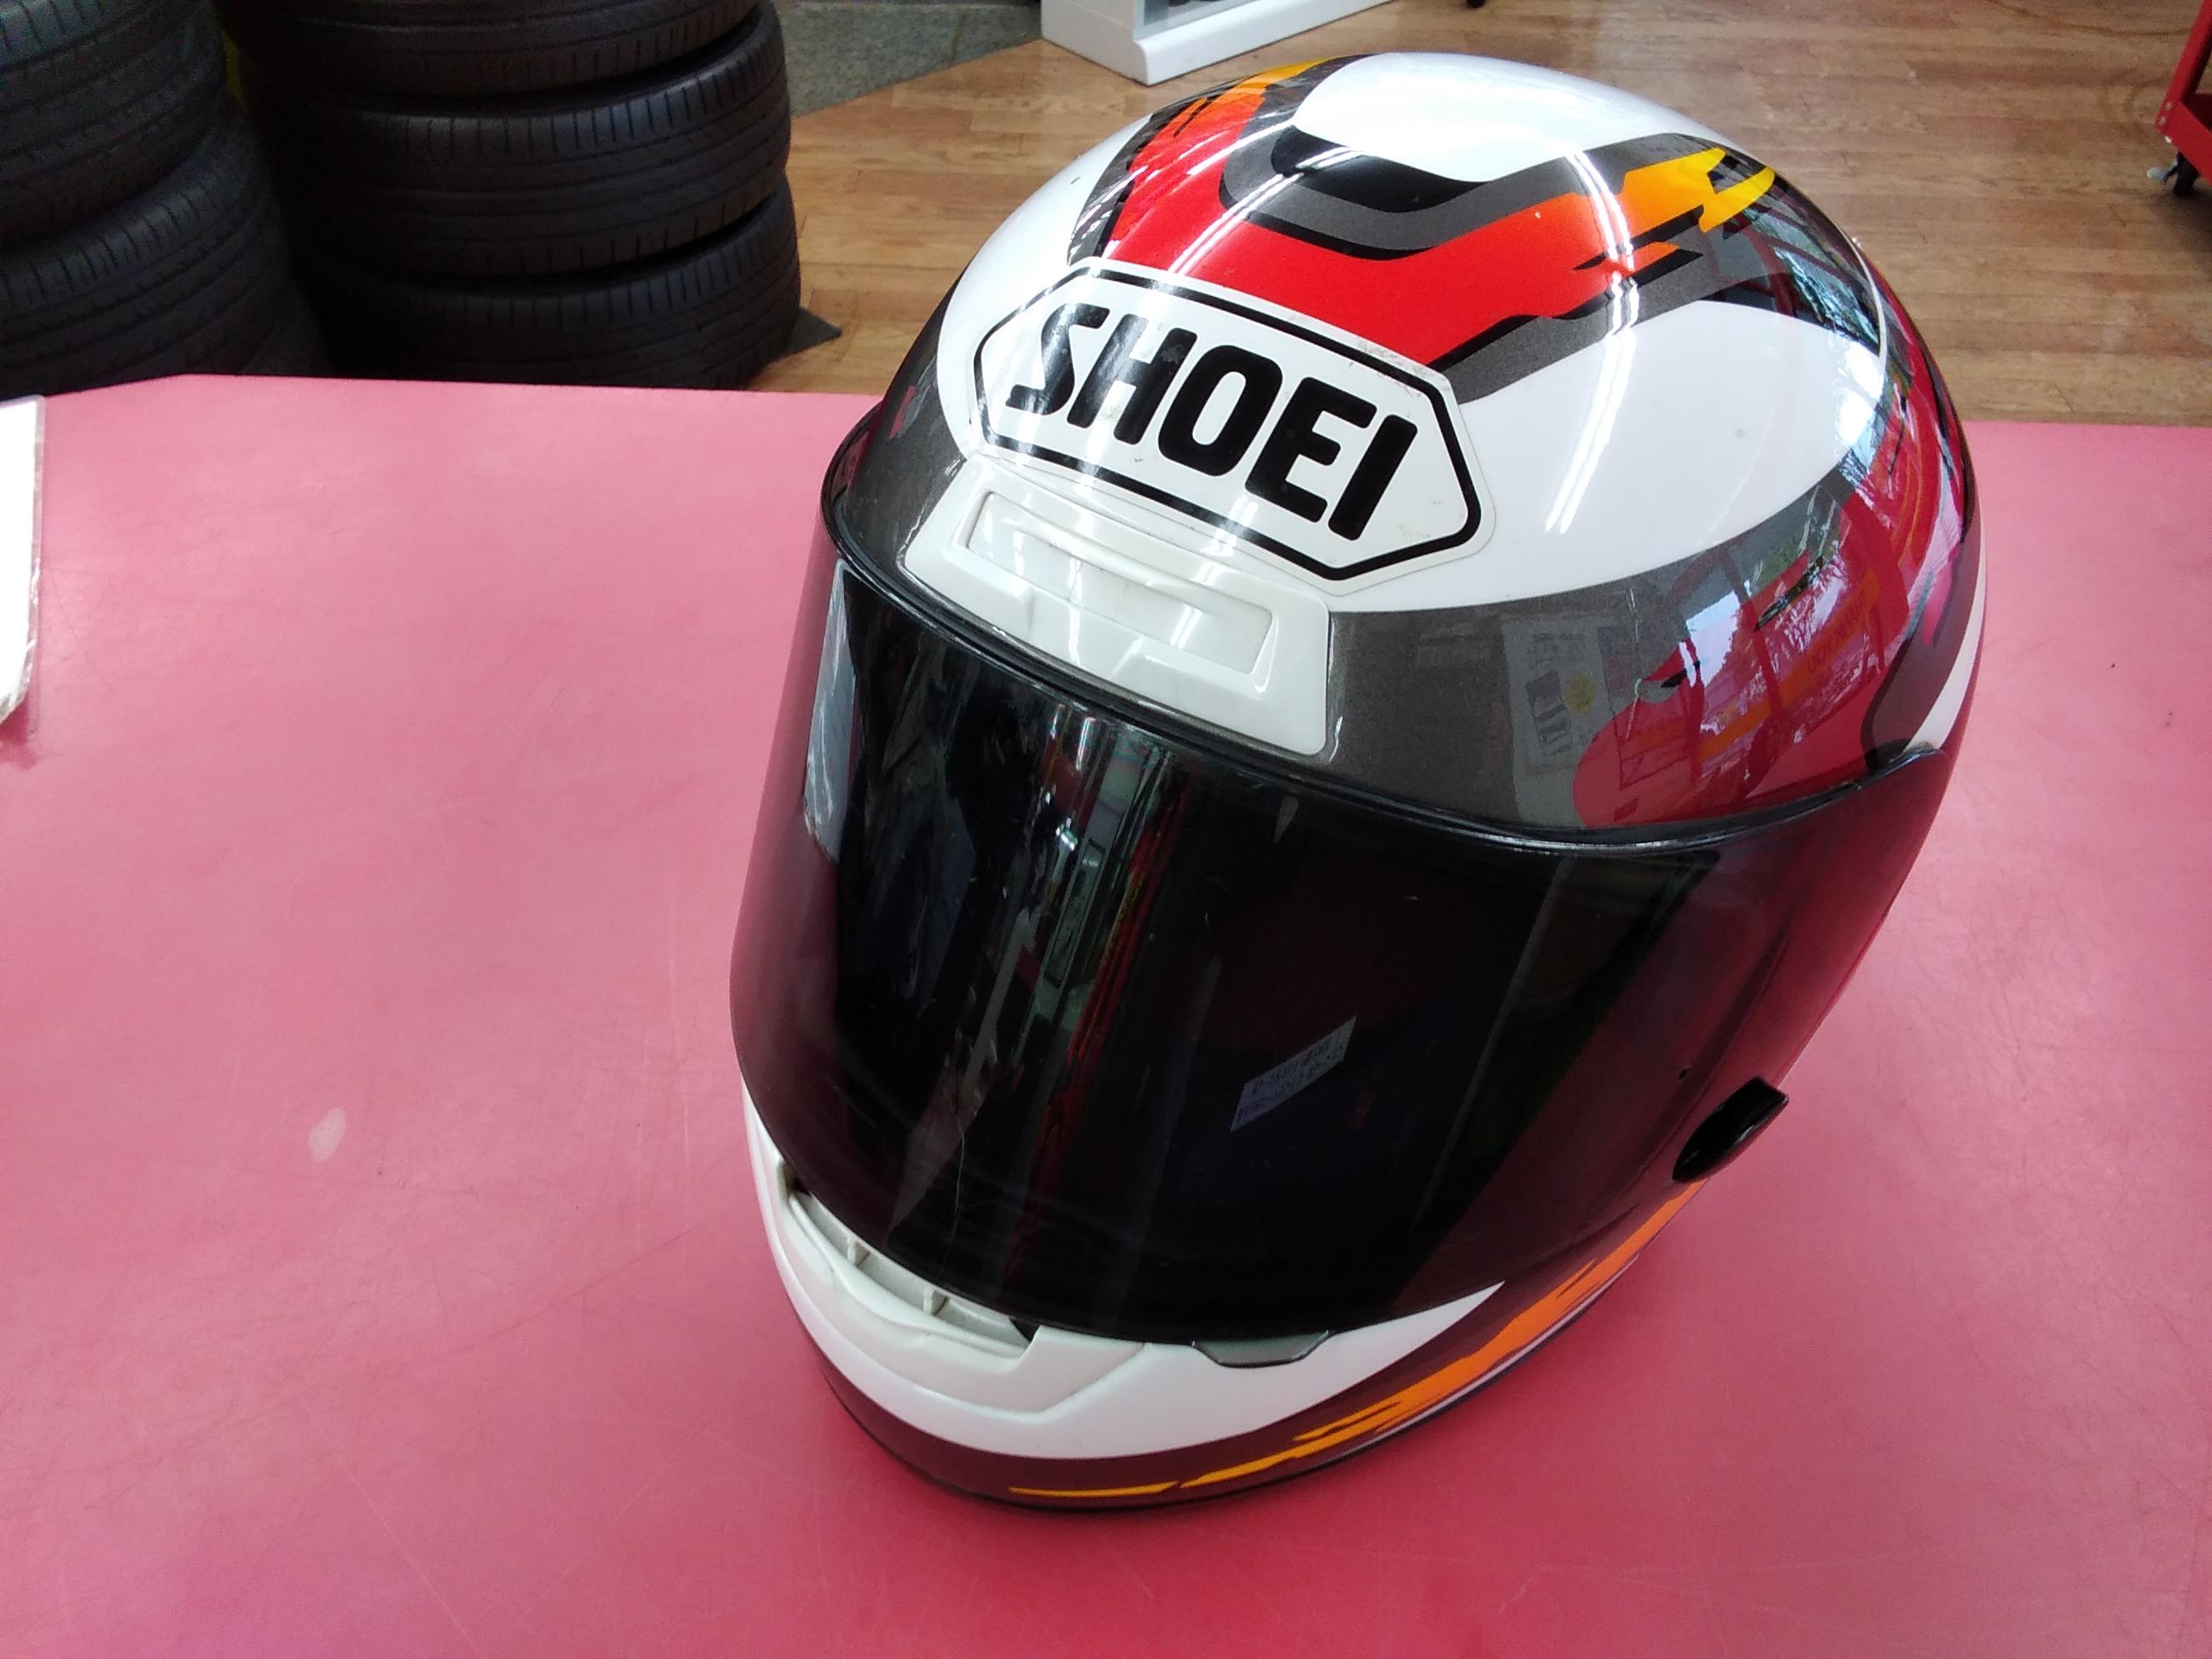 SHOEI フルフェイスヘルメット X-8V|SHOEI